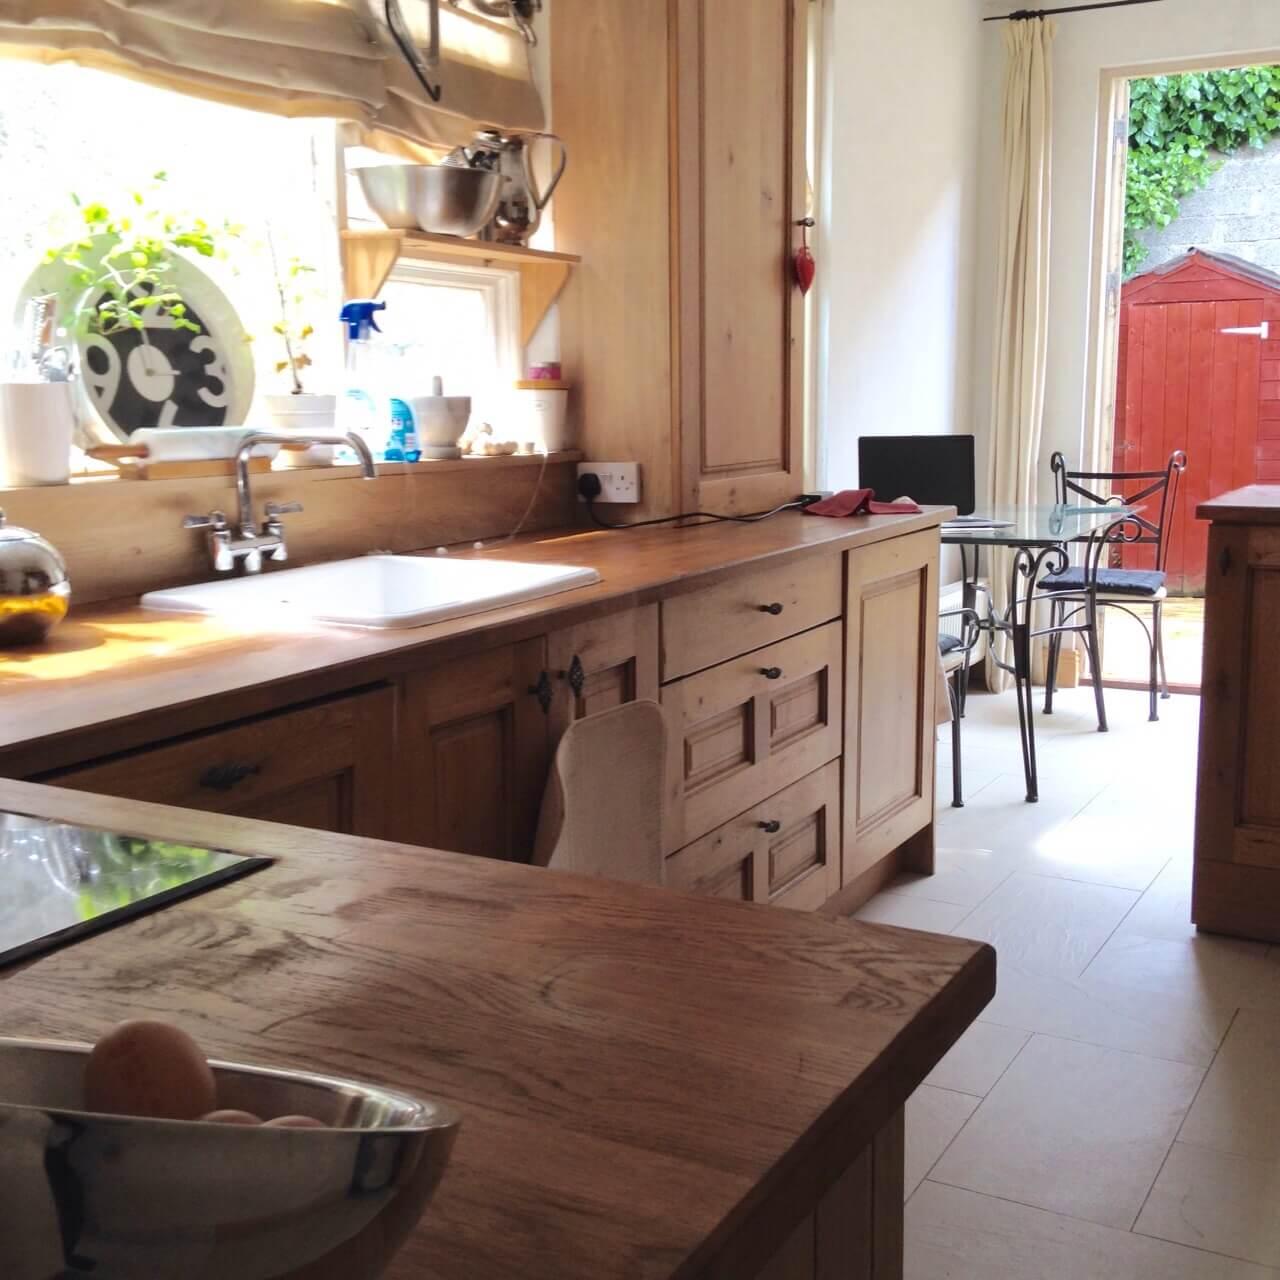 kitchen host families dublin